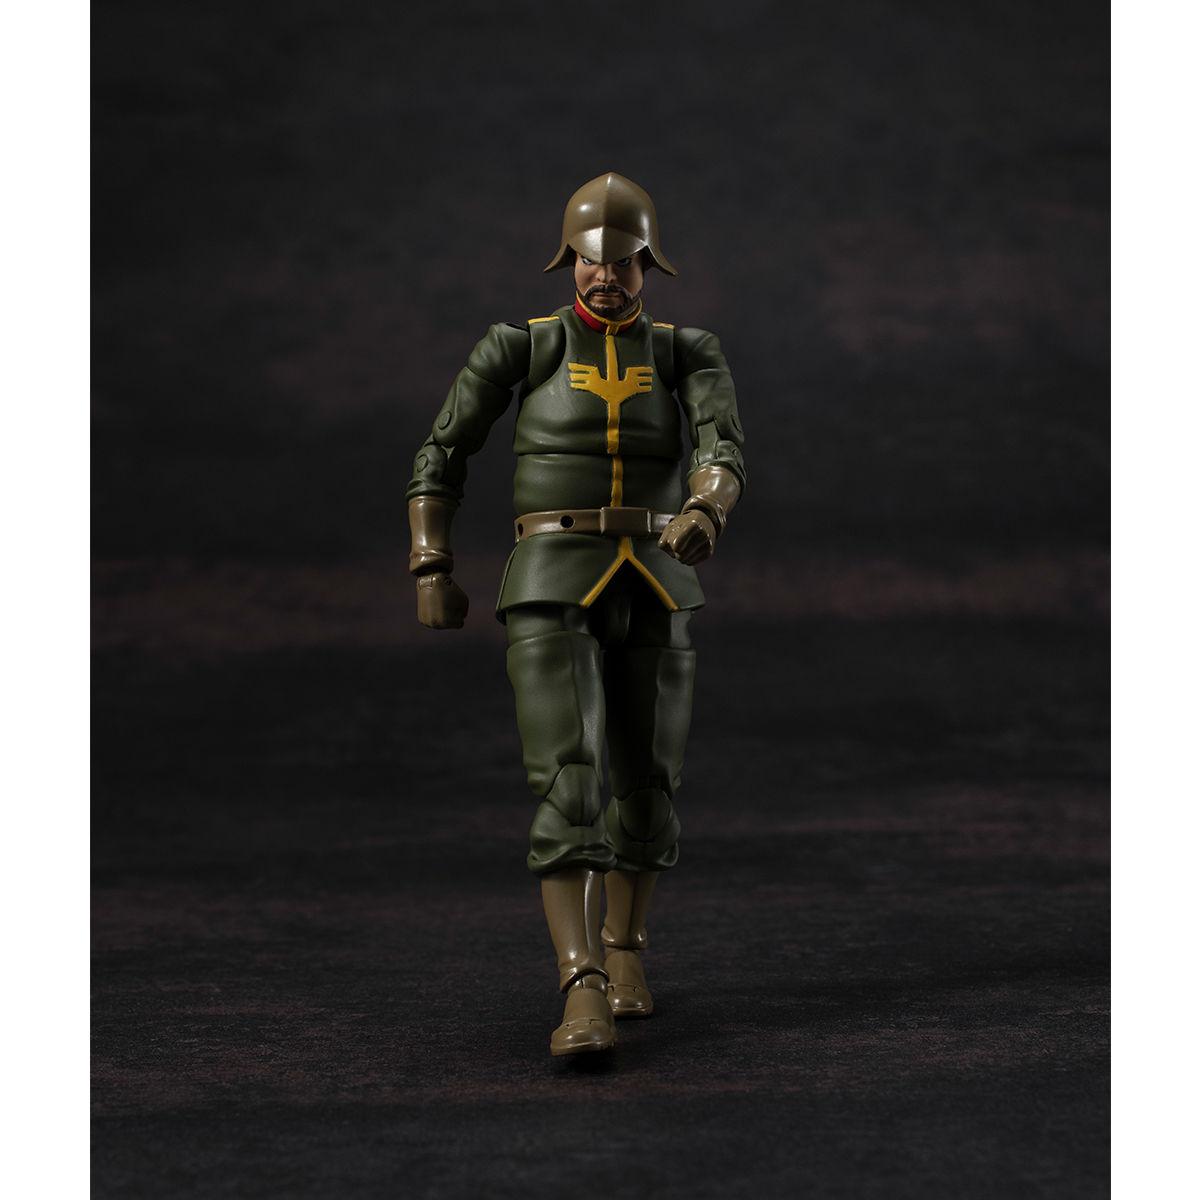 G.M.G. ガンダムミリタリージェネレーション『ジオン公国軍一般兵士01』1/18 可動フィギュア-009